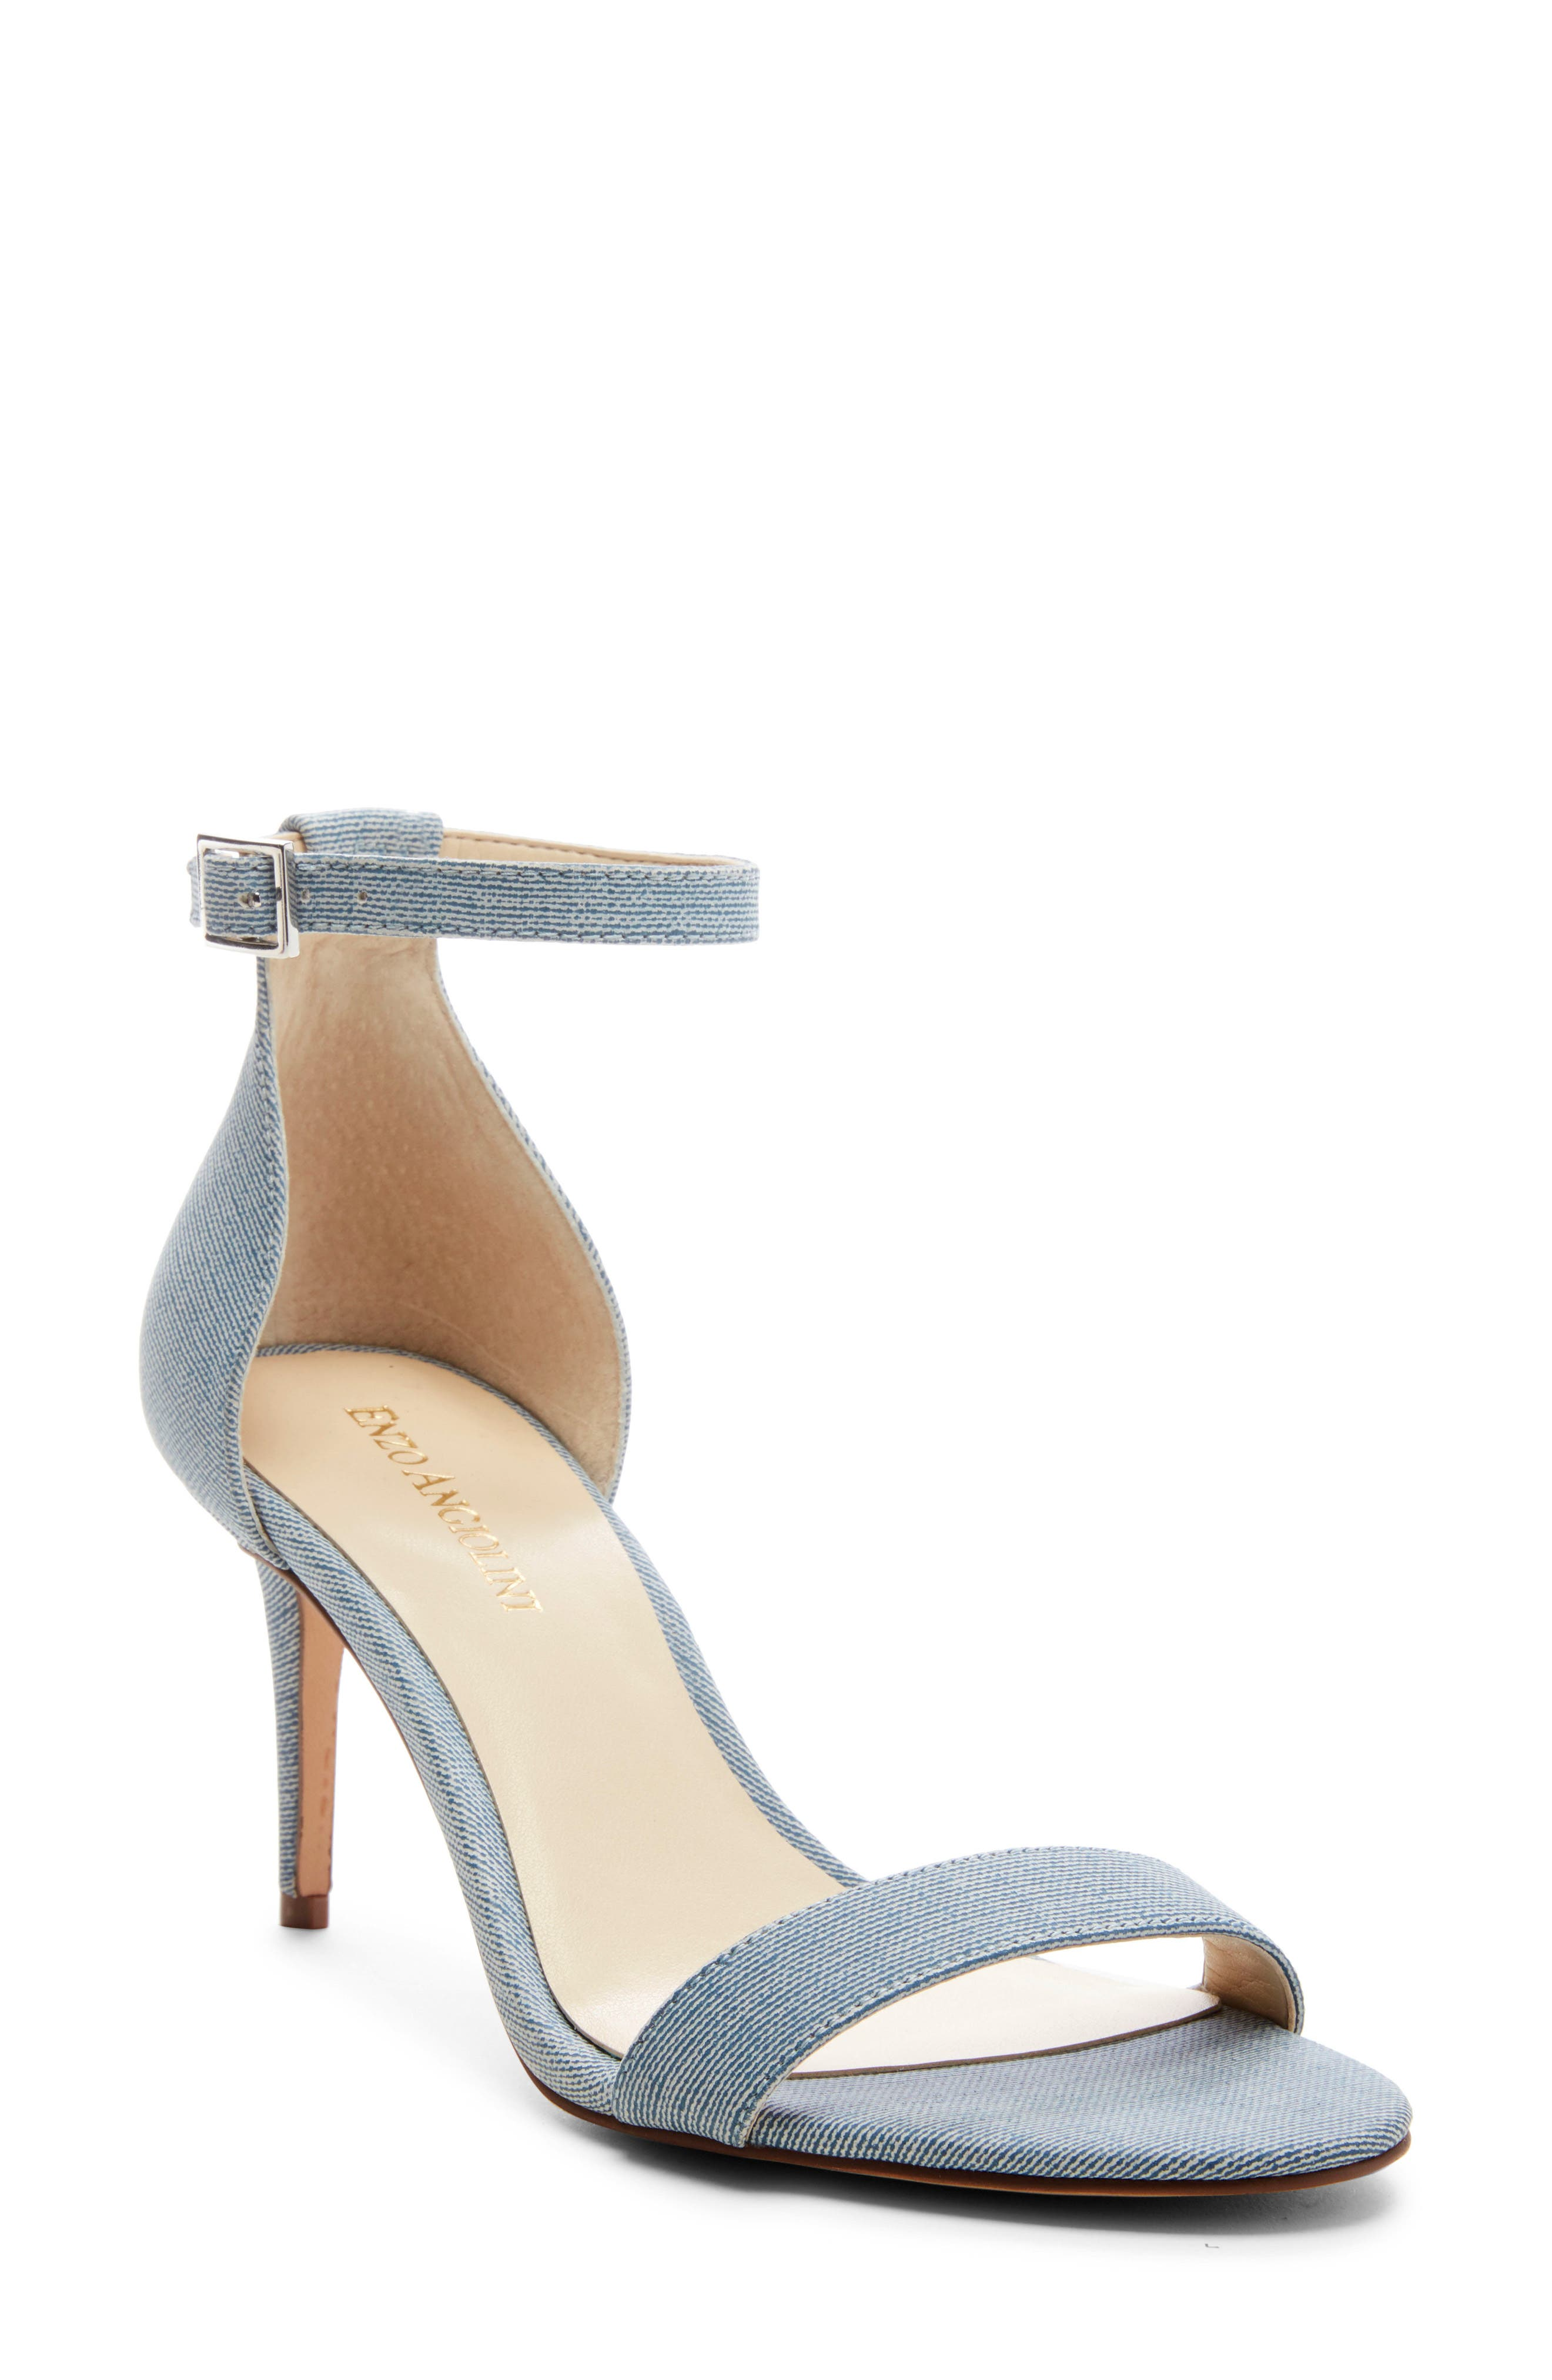 Enzo Angiolini Ahmber Ankle Strap Sandal, Blue